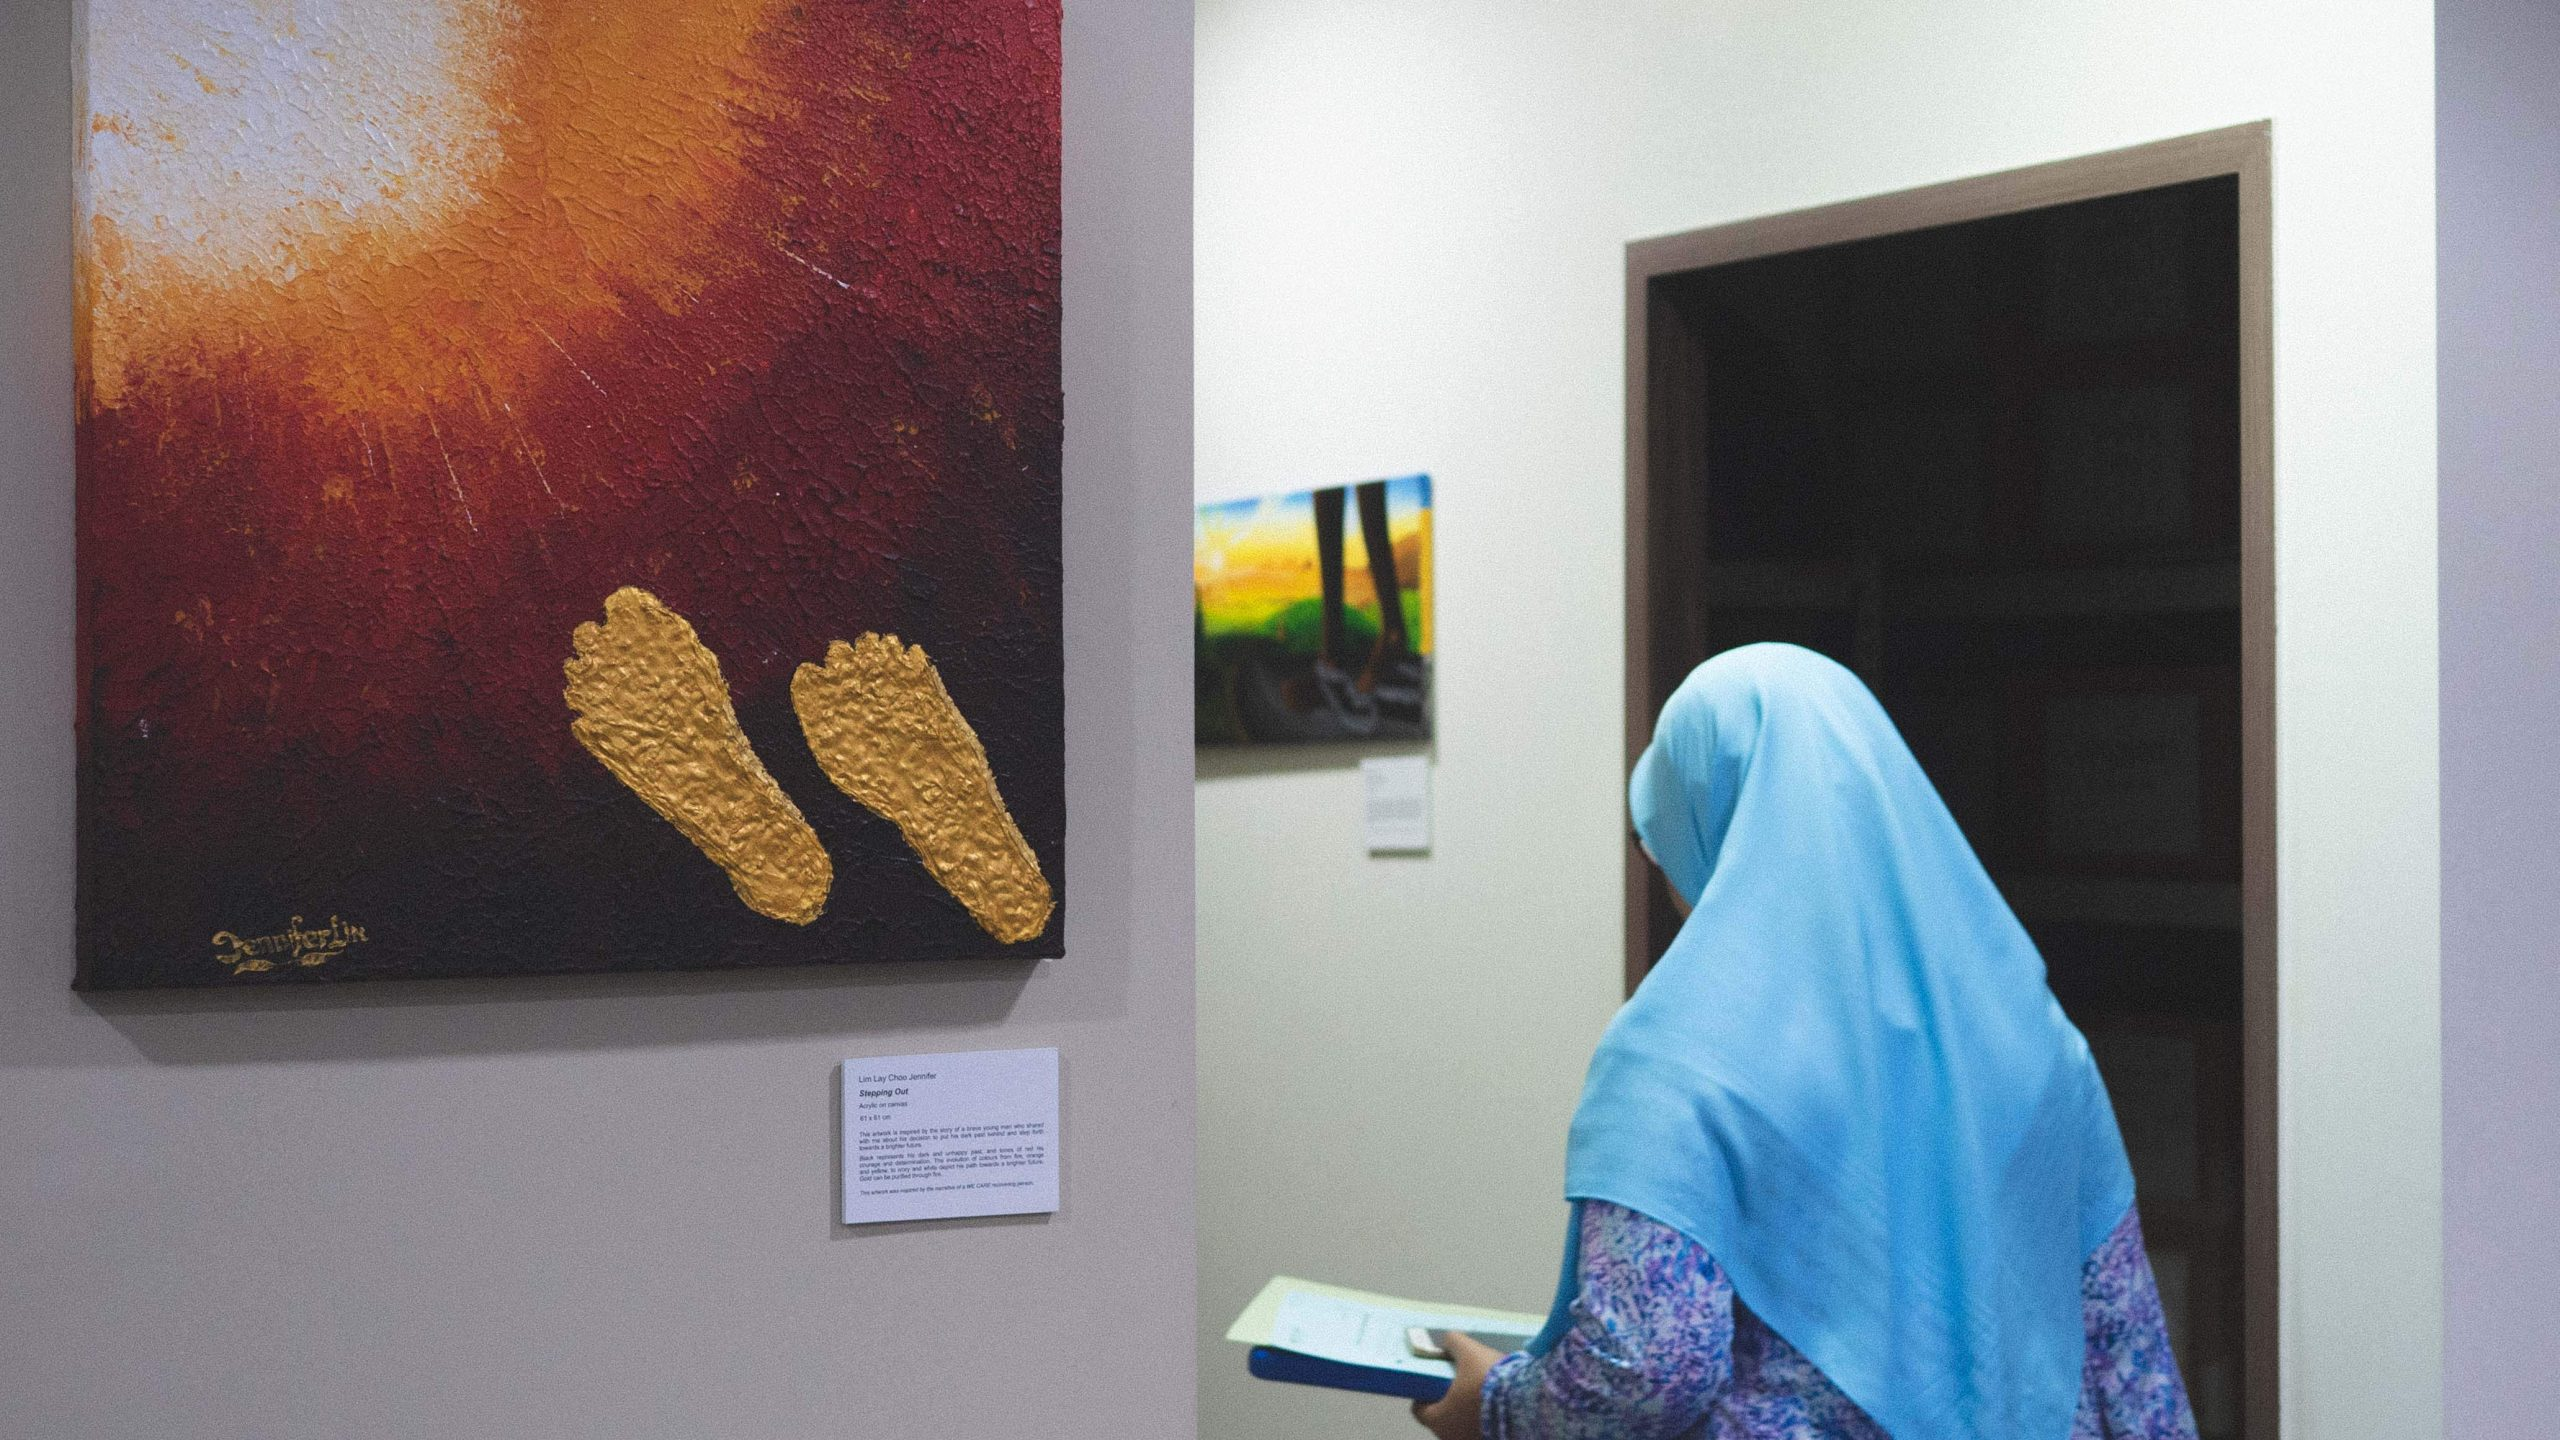 The Silent Minority: Nenek Siti Shares Her Views On Race